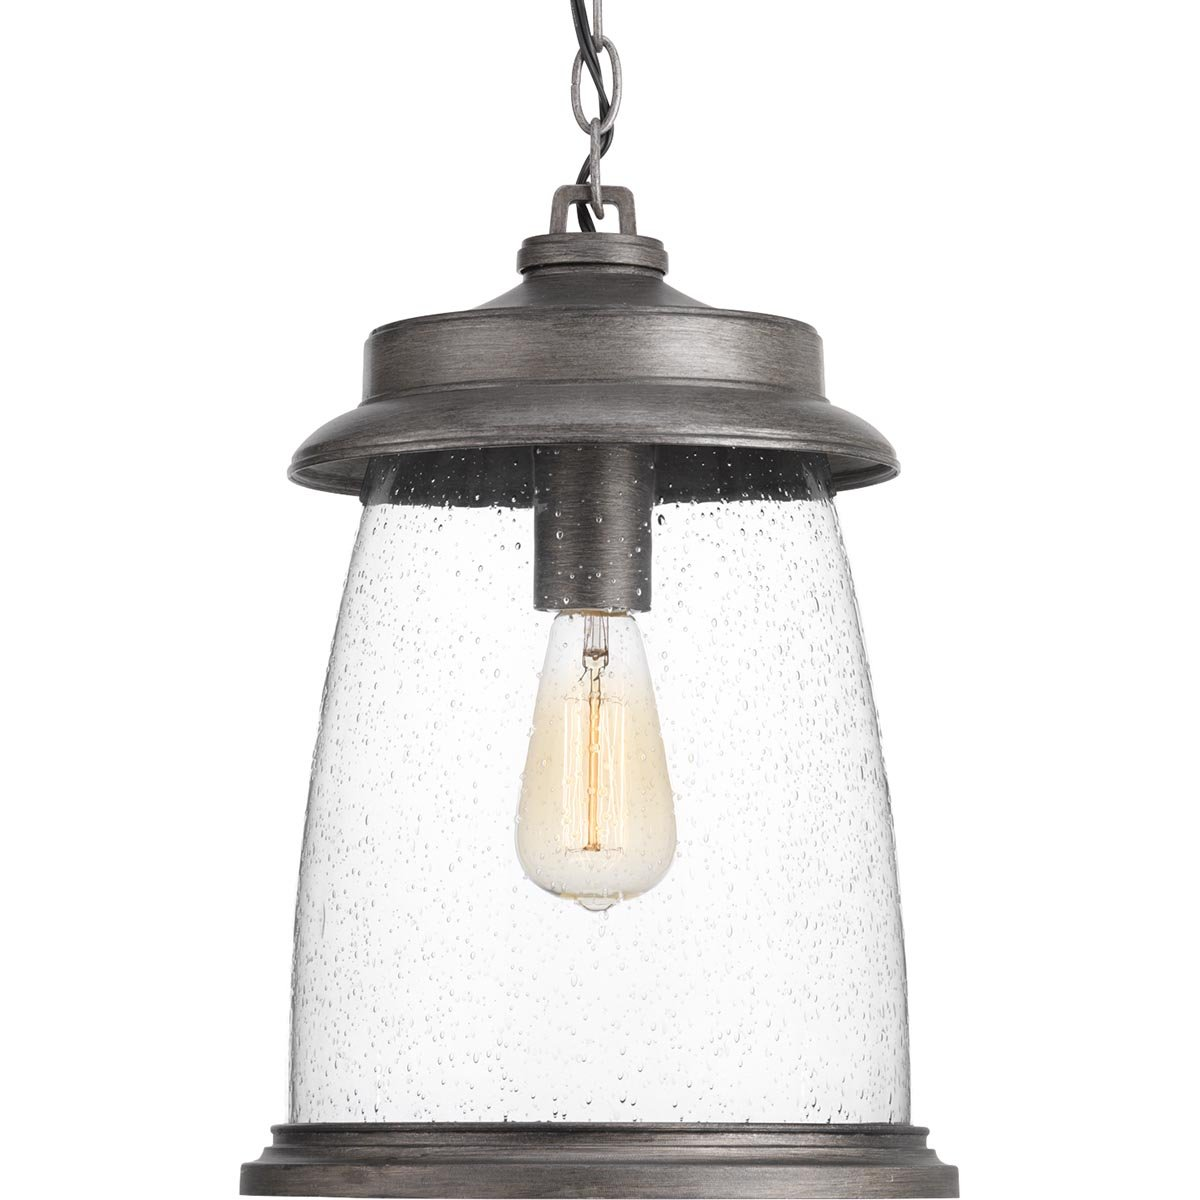 Progress Lighting P550030-103 Conover Hanging Lantern Grey